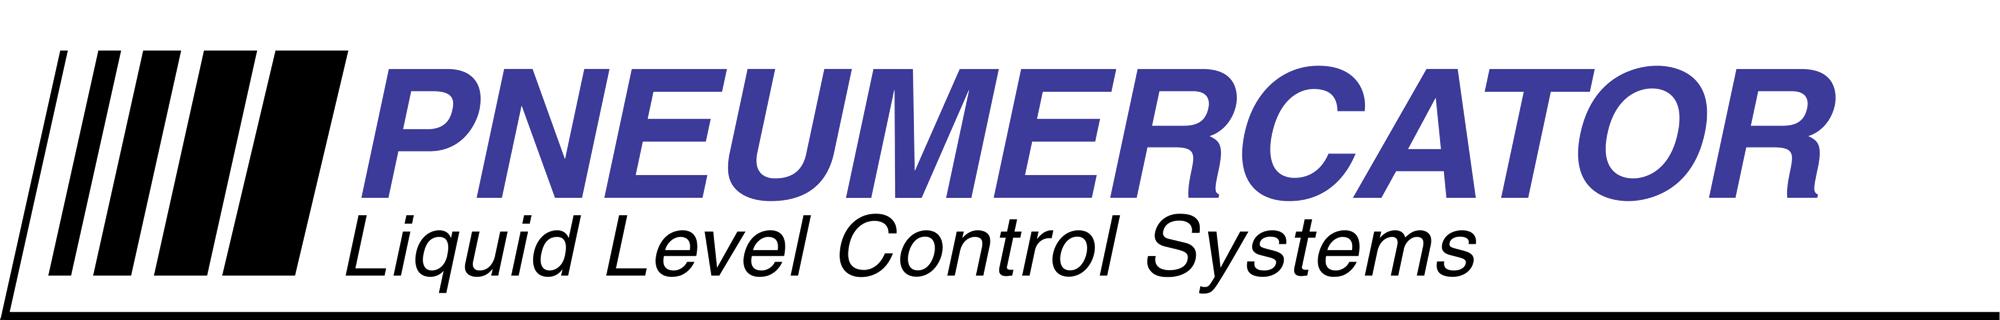 Pneumercator Logo